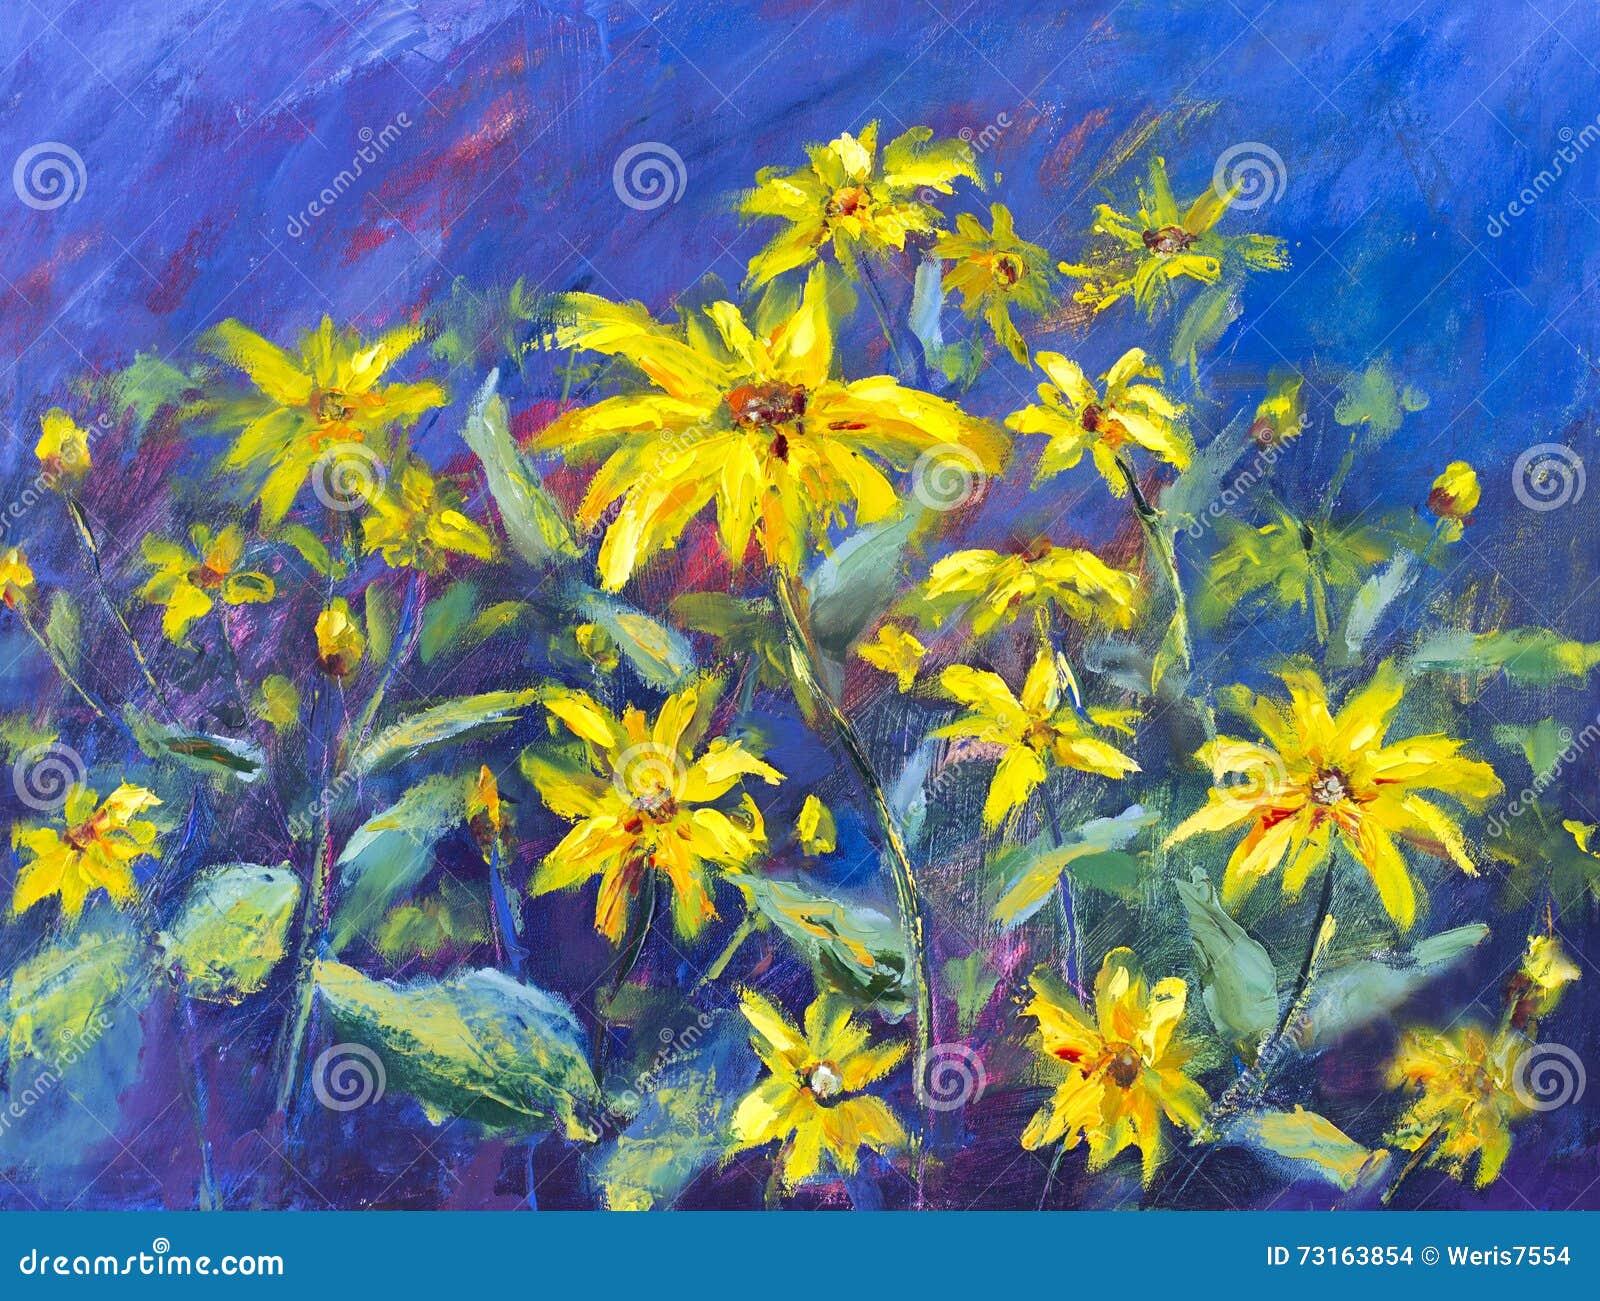 Flowers field oil painting yellow flowers on blue background stock download flowers field oil painting yellow flowers on blue background stock illustration illustration mightylinksfo